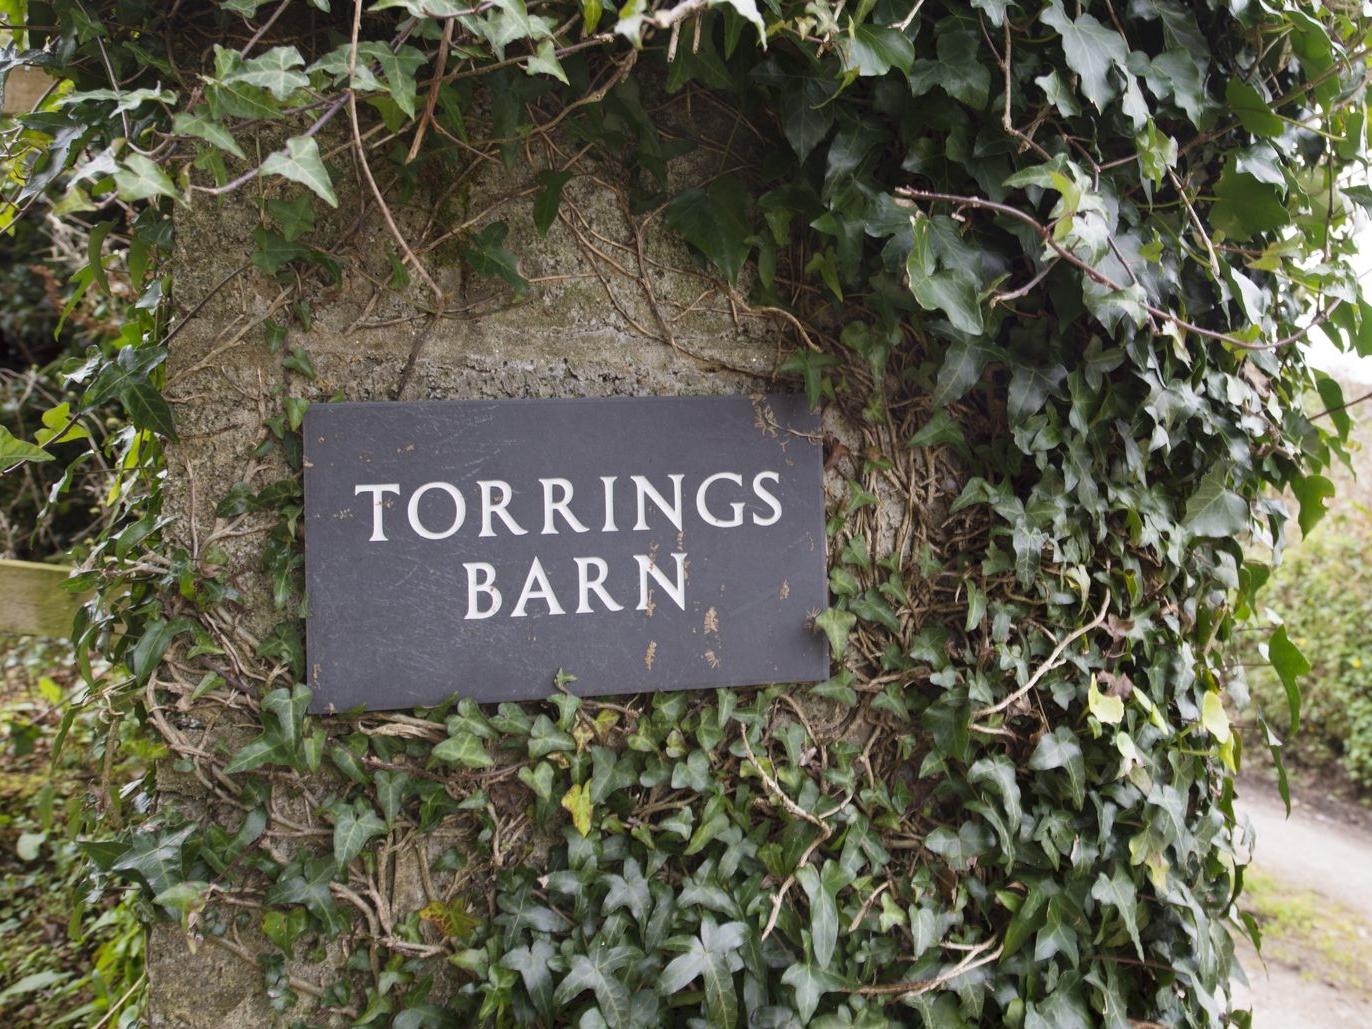 Torrings Barn